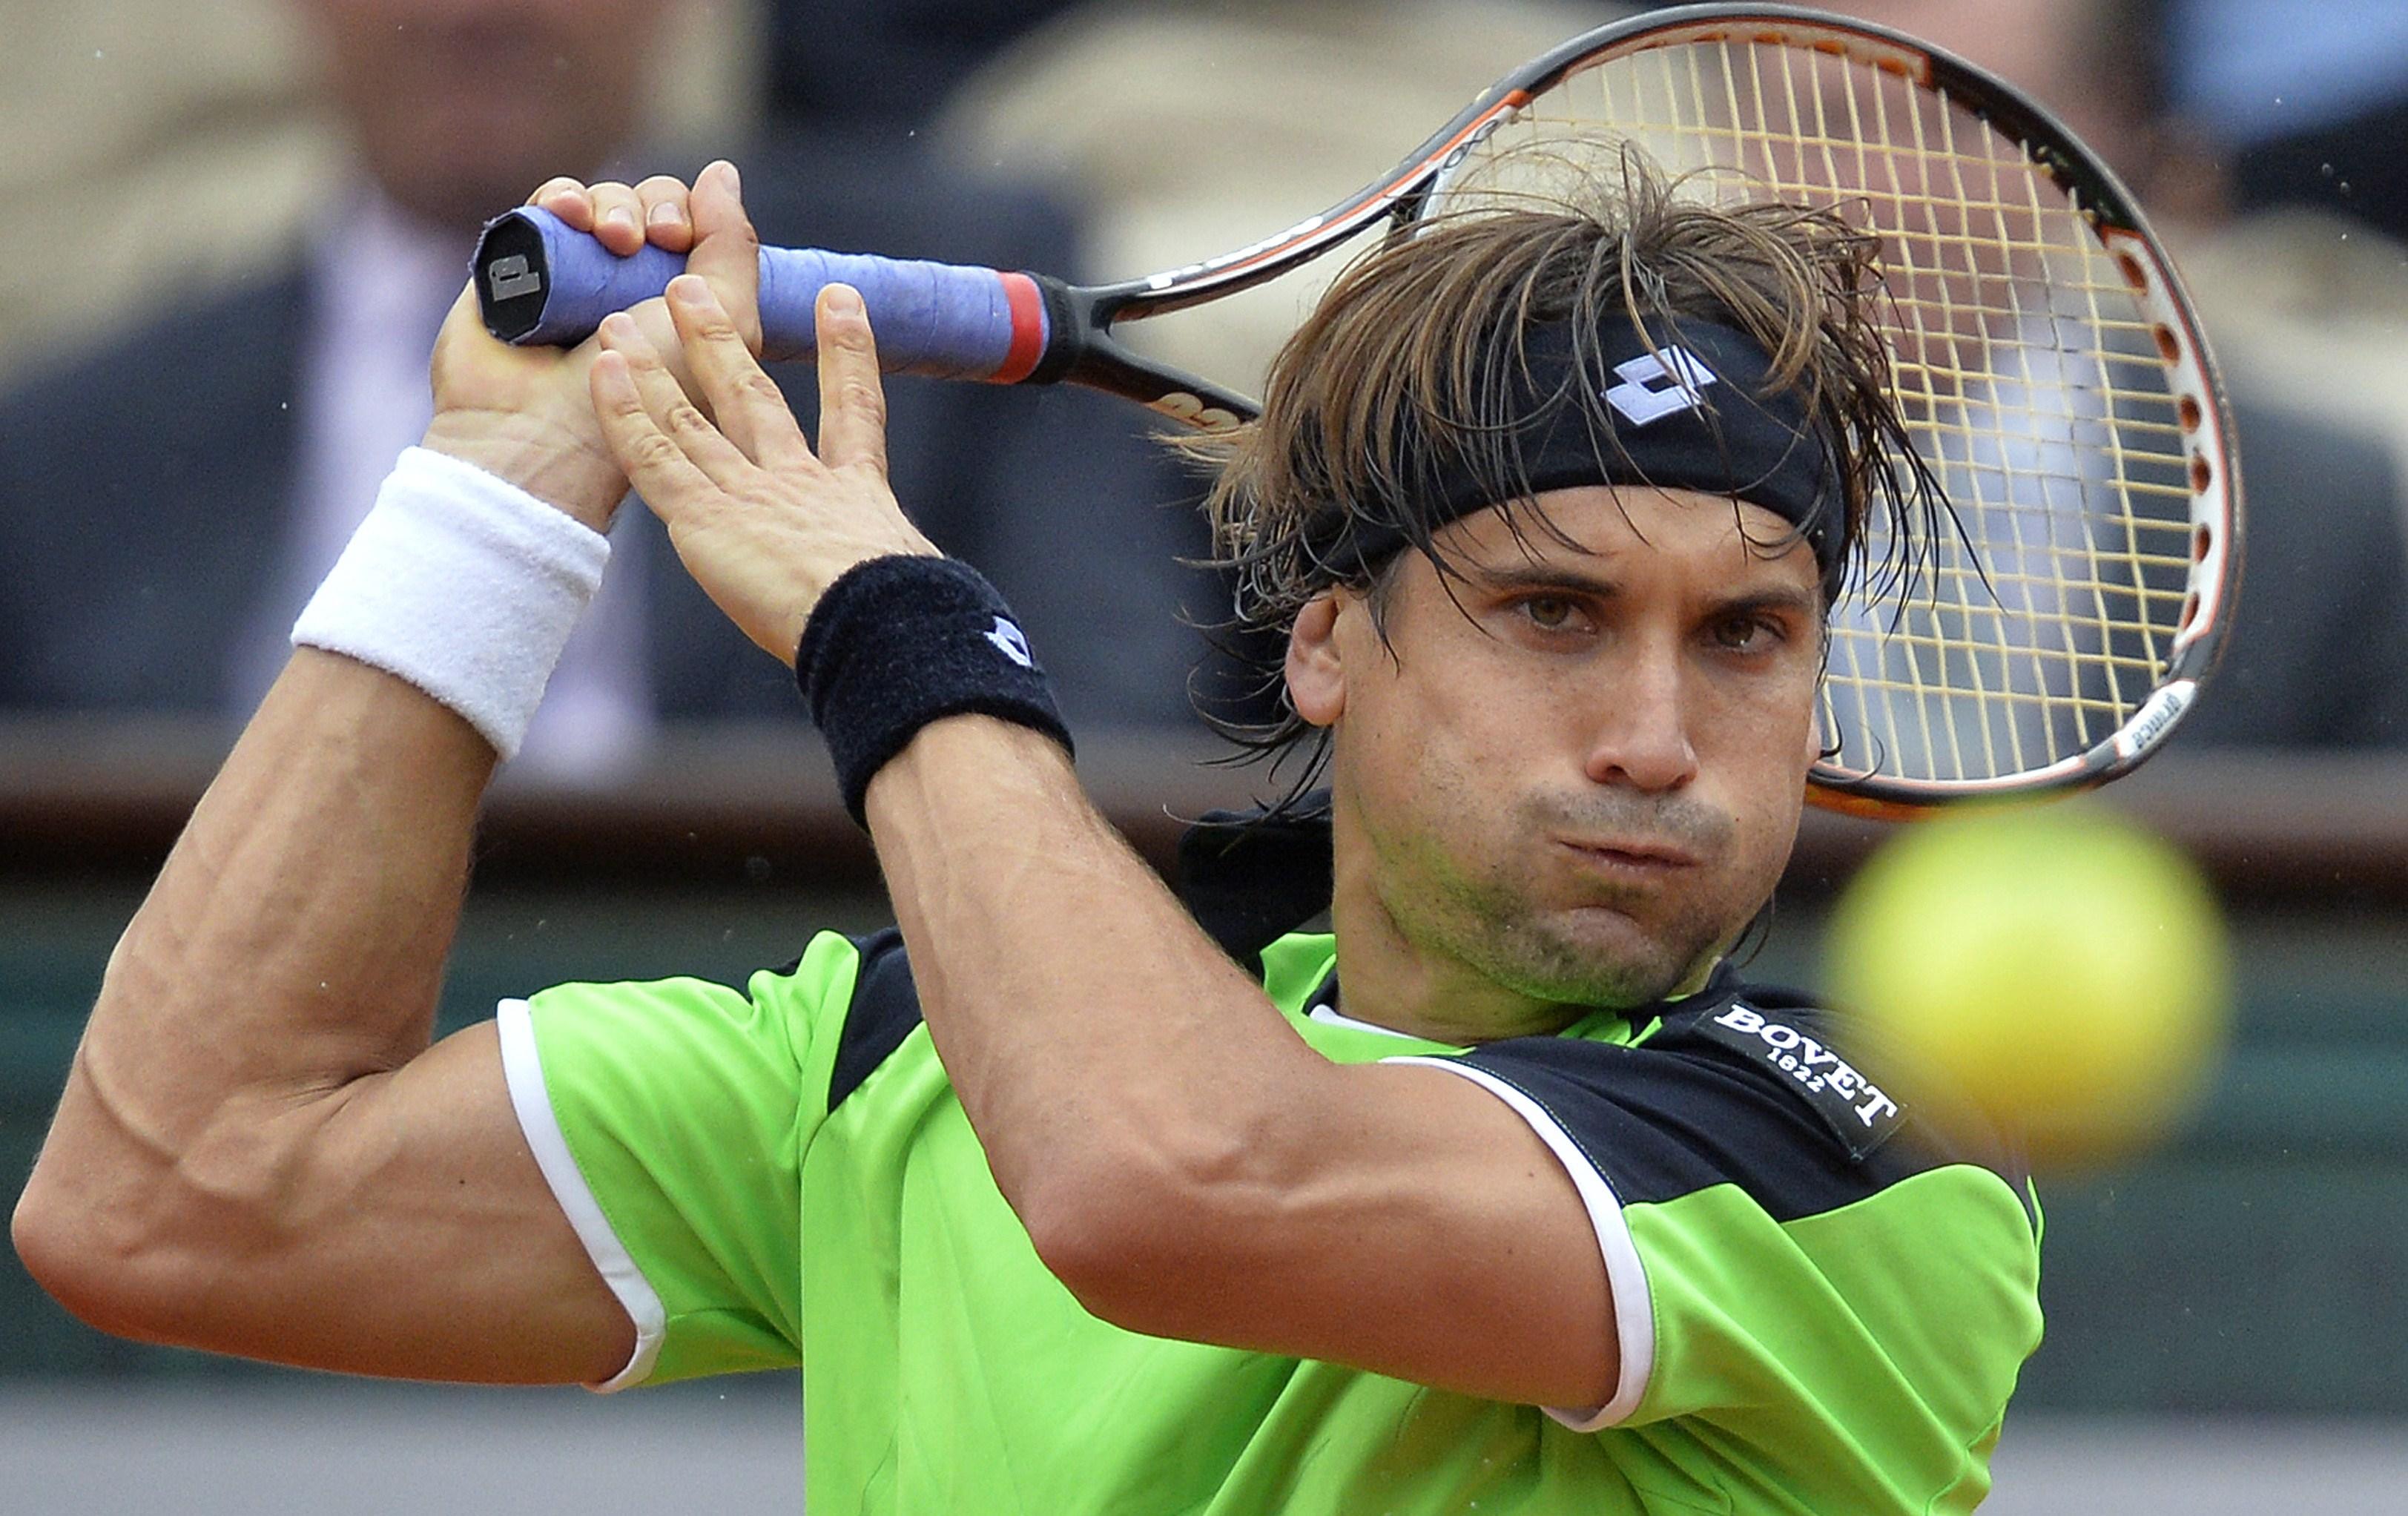 TOPSHOTS Spain's David Ferrer returns a